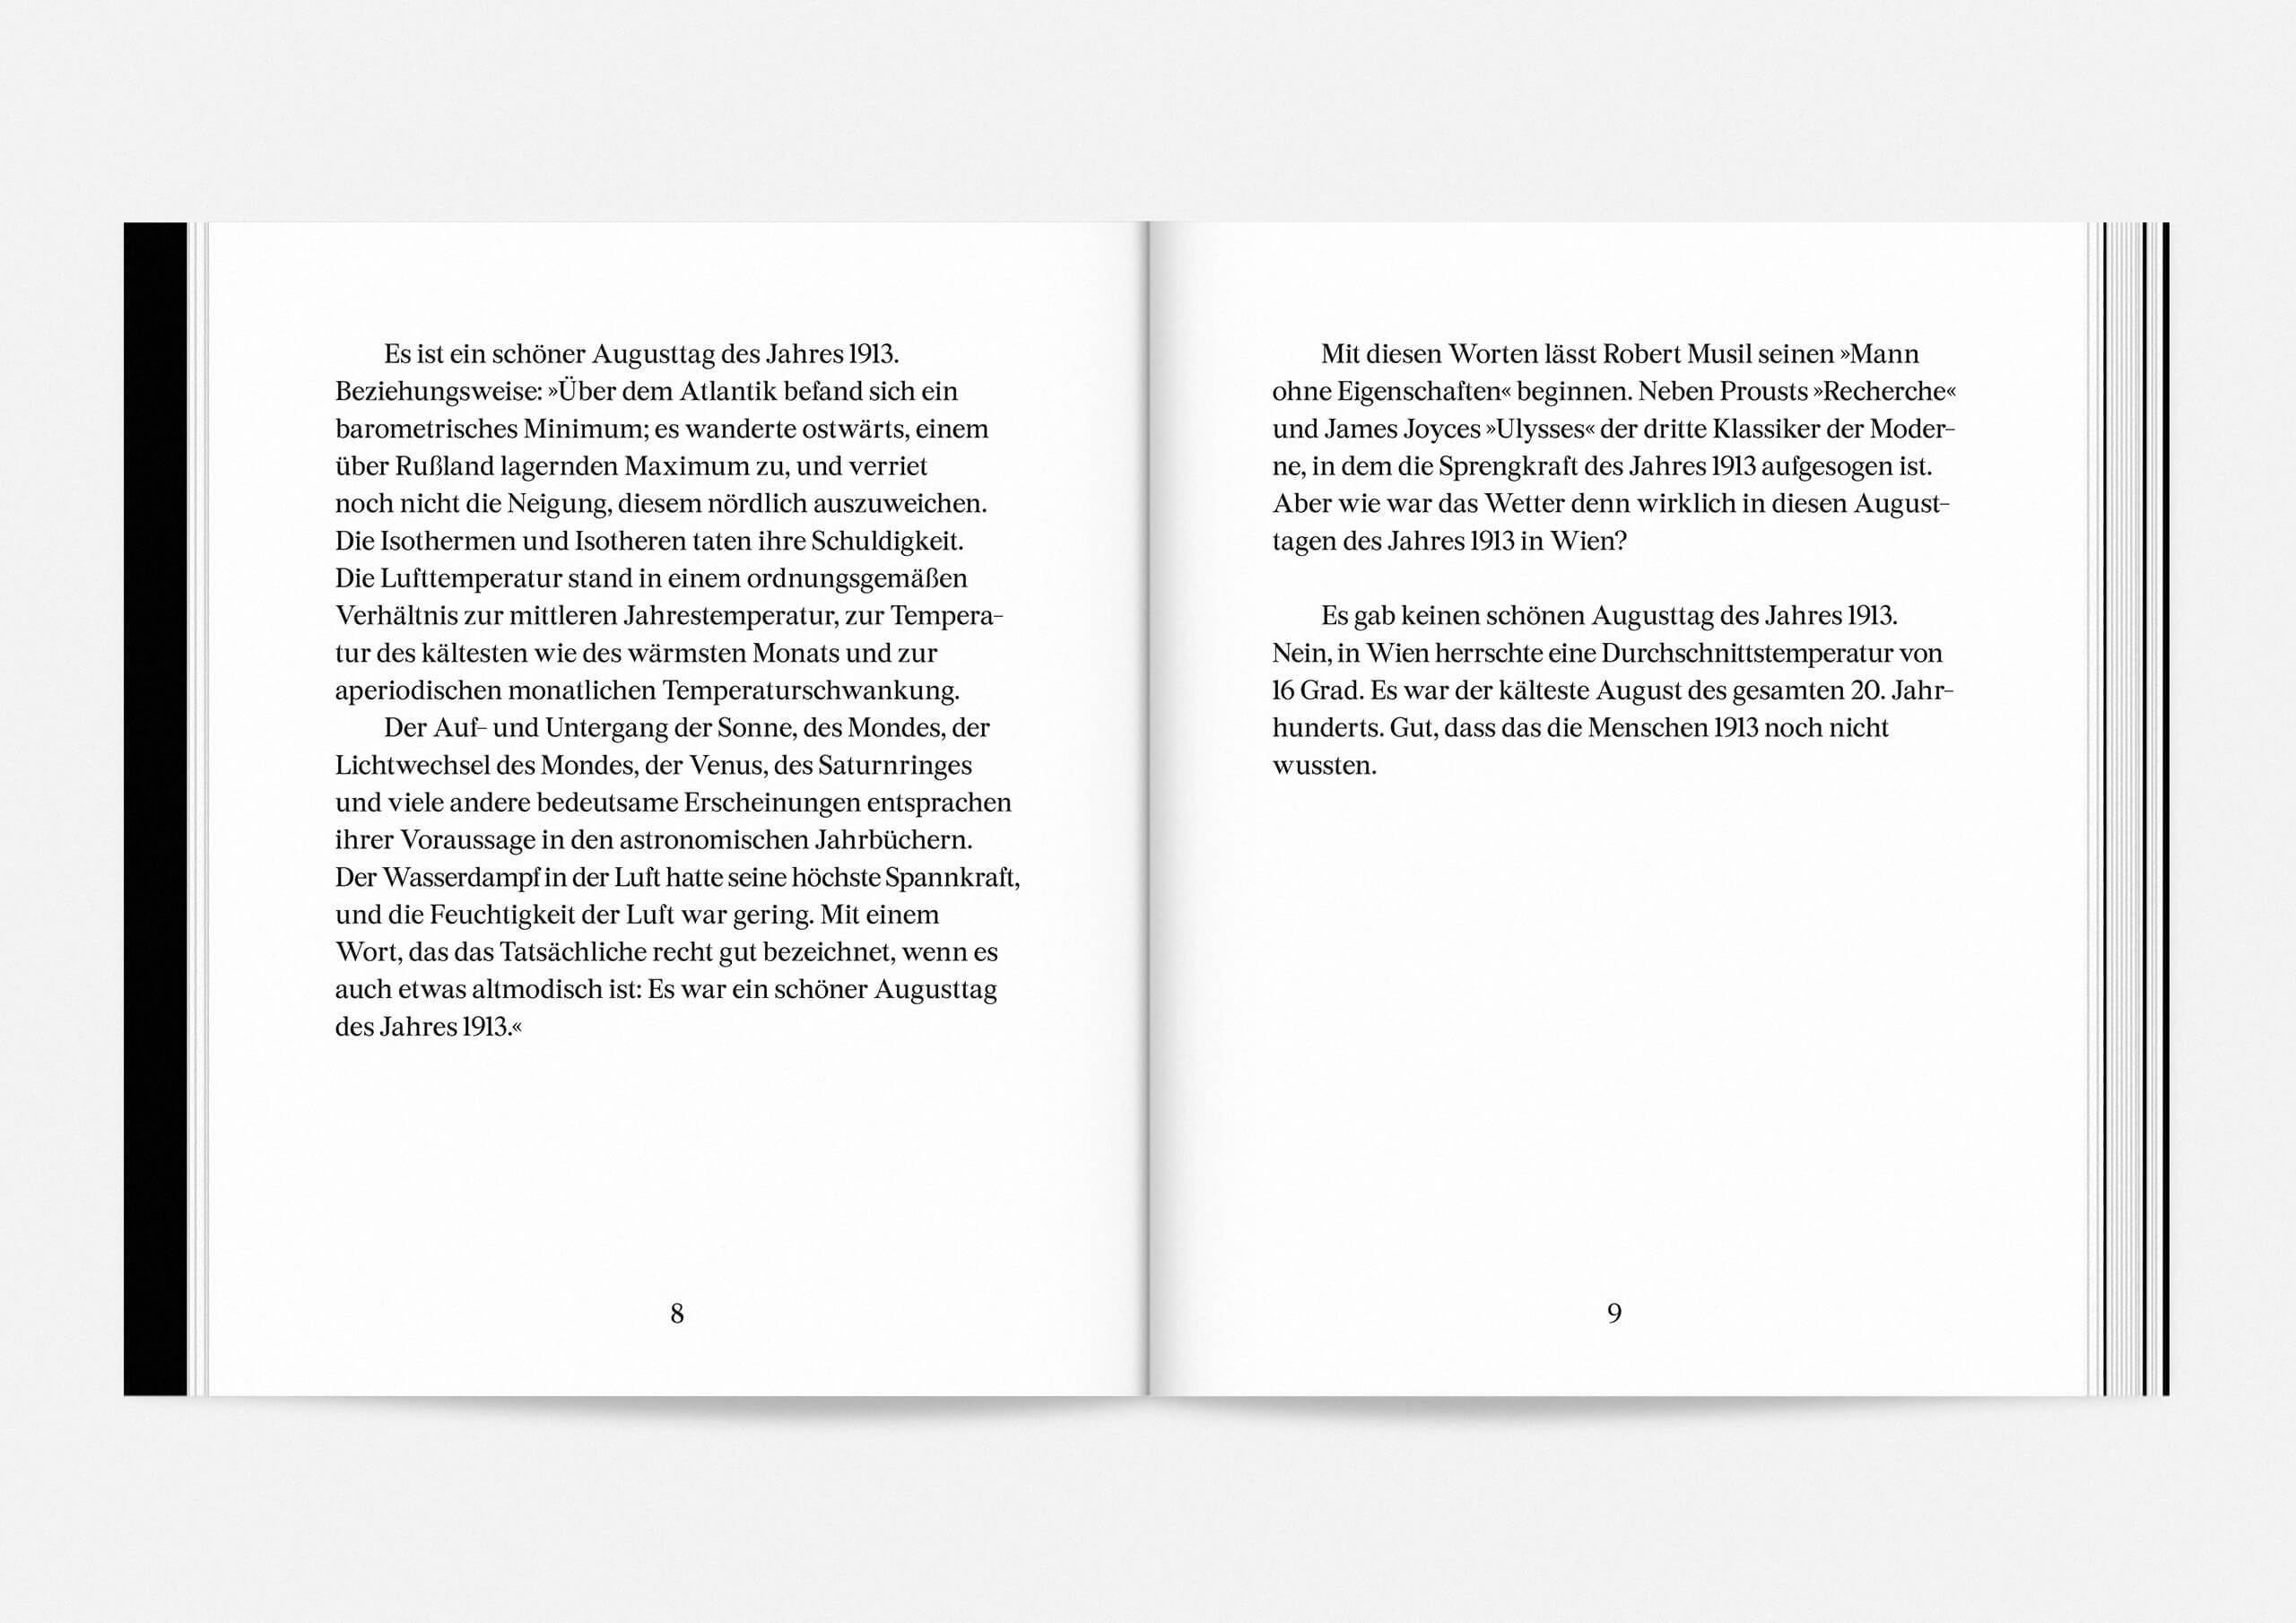 https://neuegestaltung.de/media/pages/clients/andreas-muhe-pathos-als-distanz/f4719eb4c9-1597415200/am_dth_ng-web_s.08-09.jpg